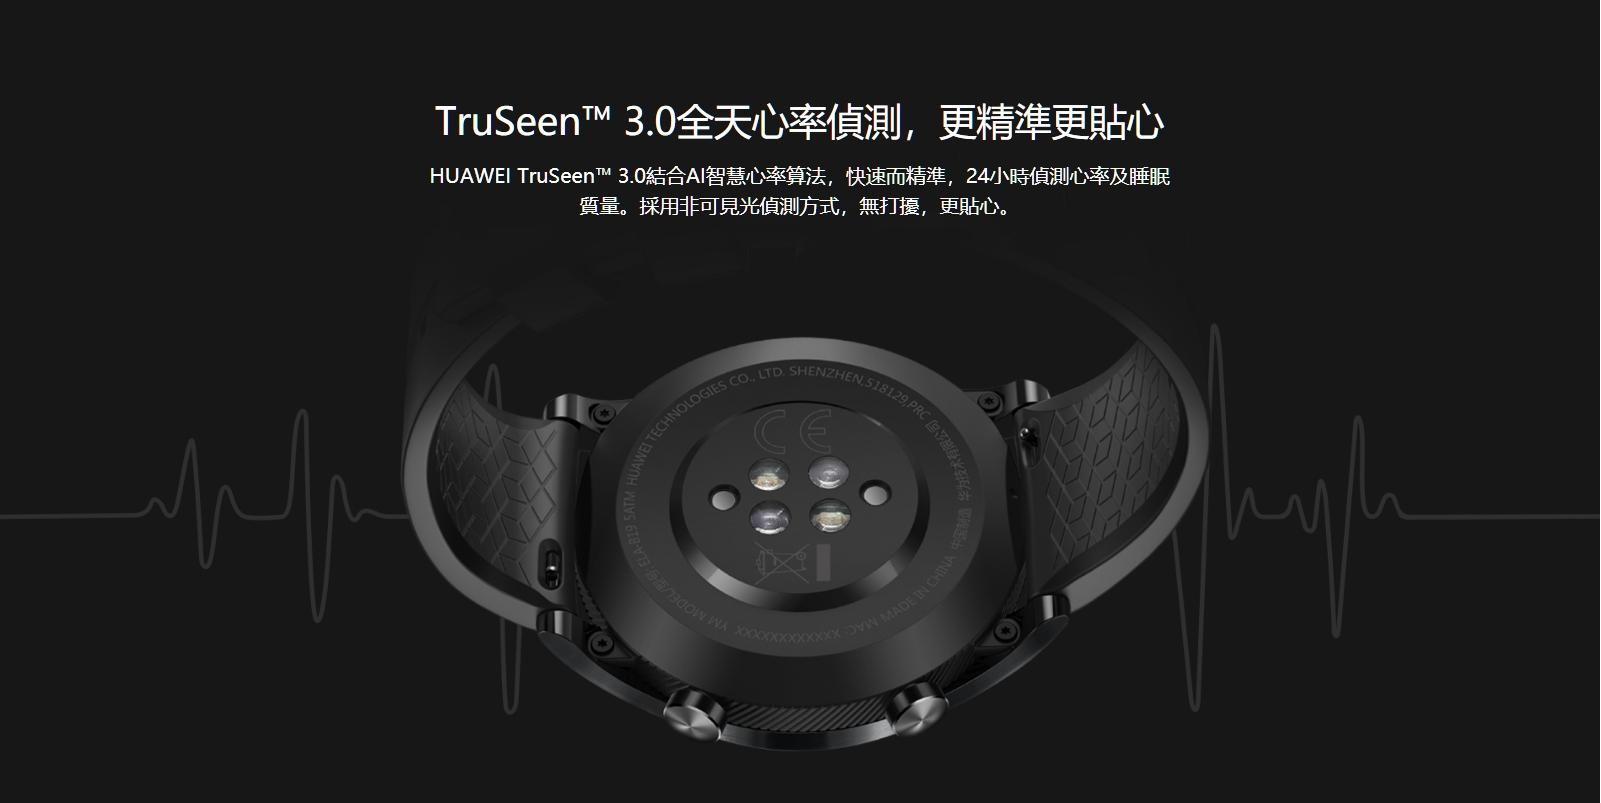 Watch GT TruSeen™ 3.0全天心率偵測,更精準更貼心